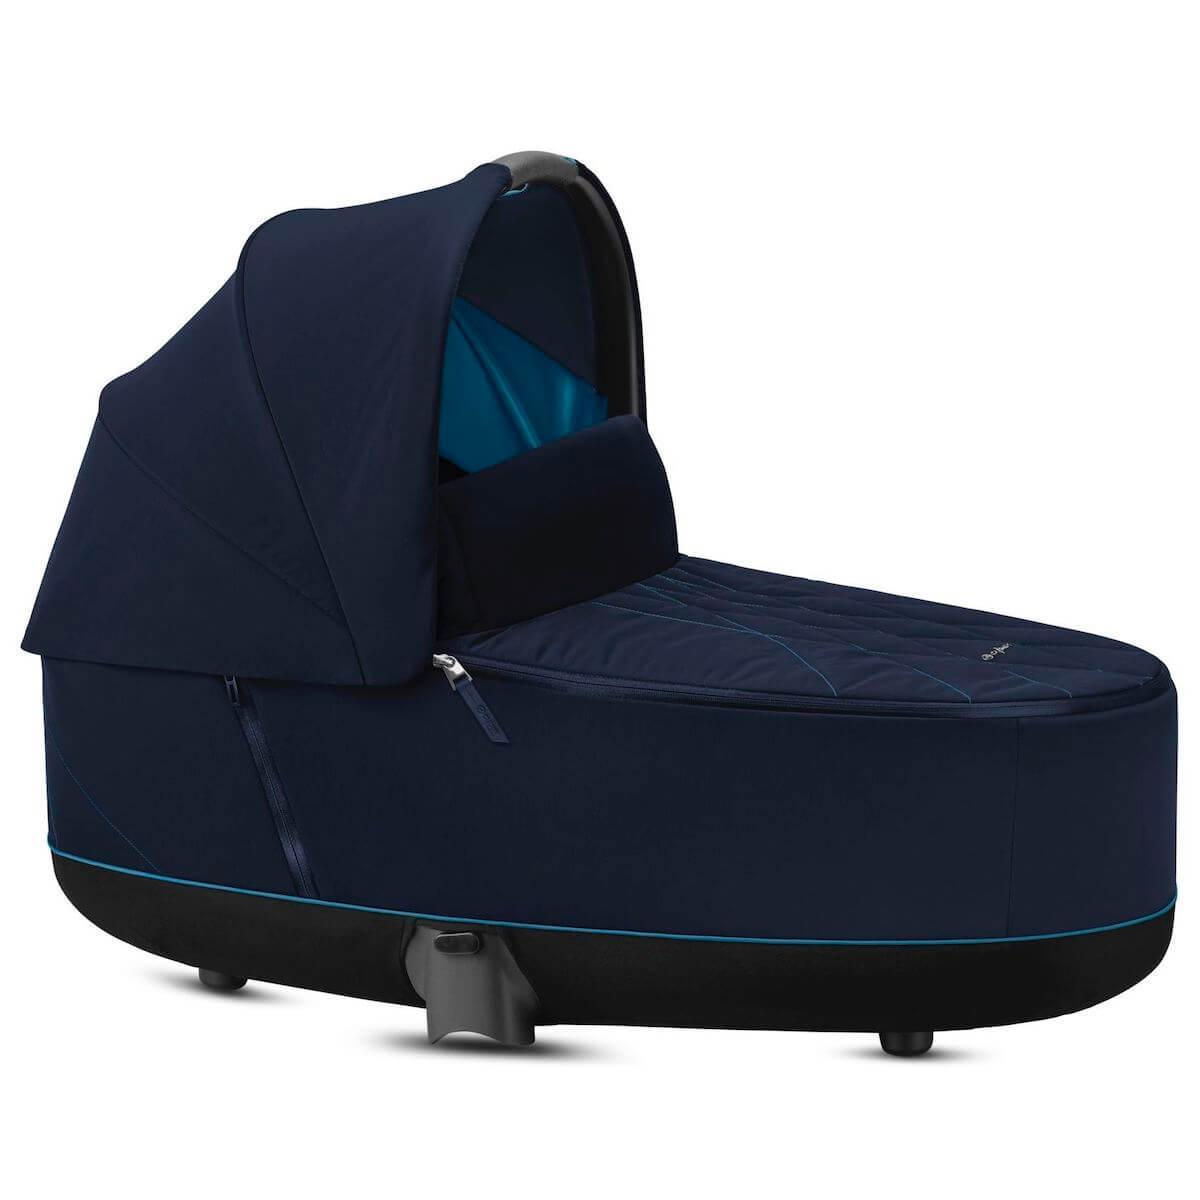 Capazo de luxe PRIAM Cybex Nautical blue